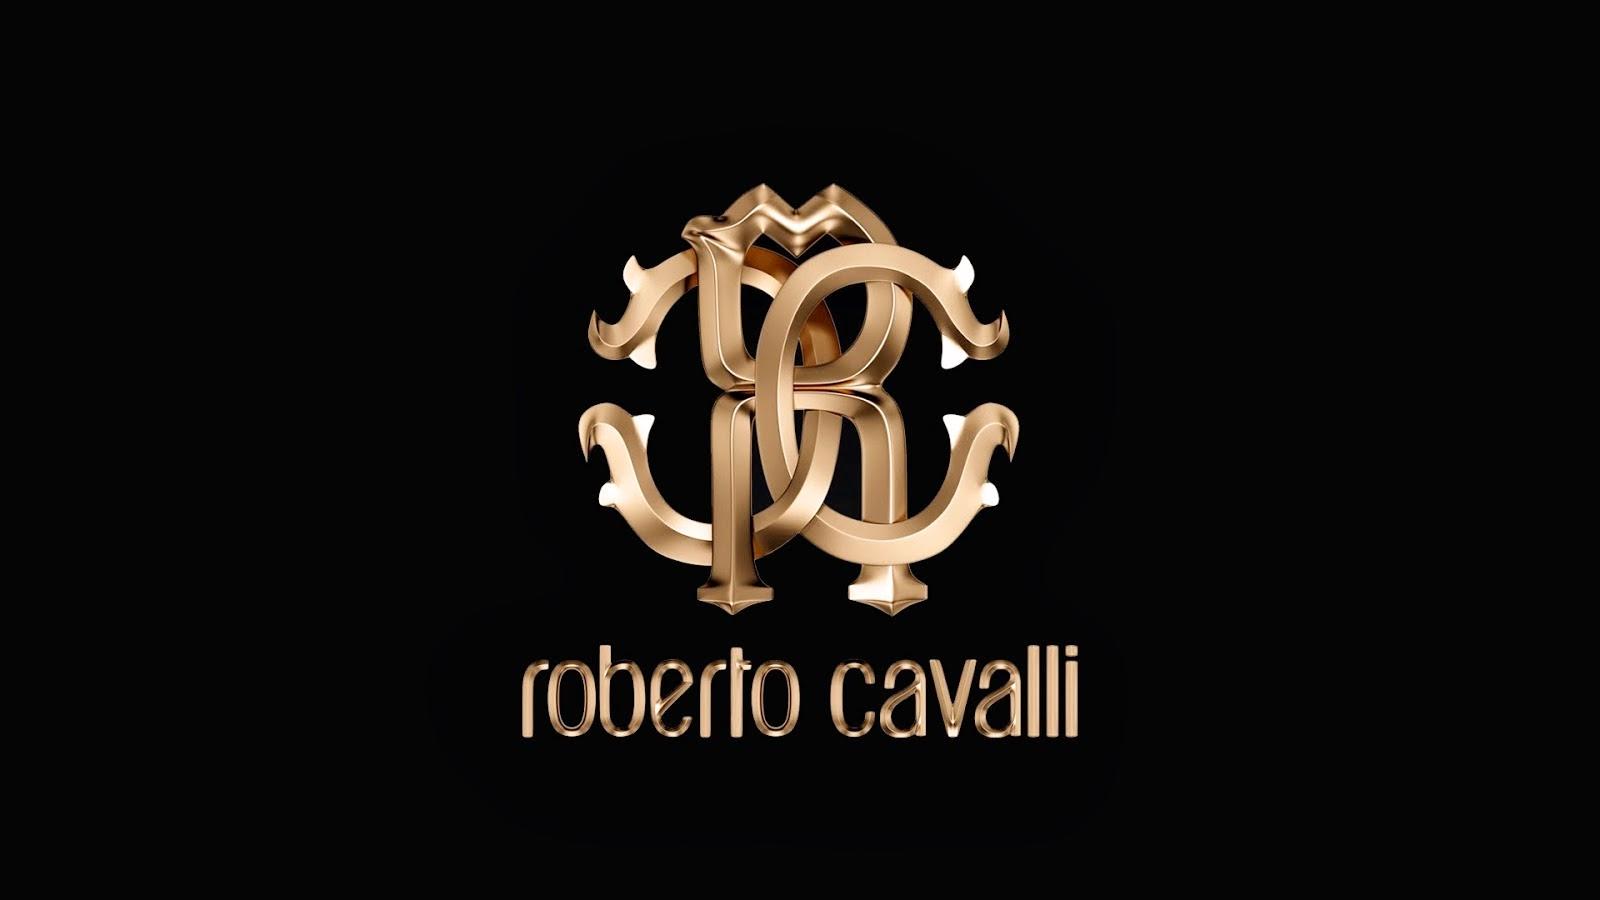 ROBERTO CAVALLI.